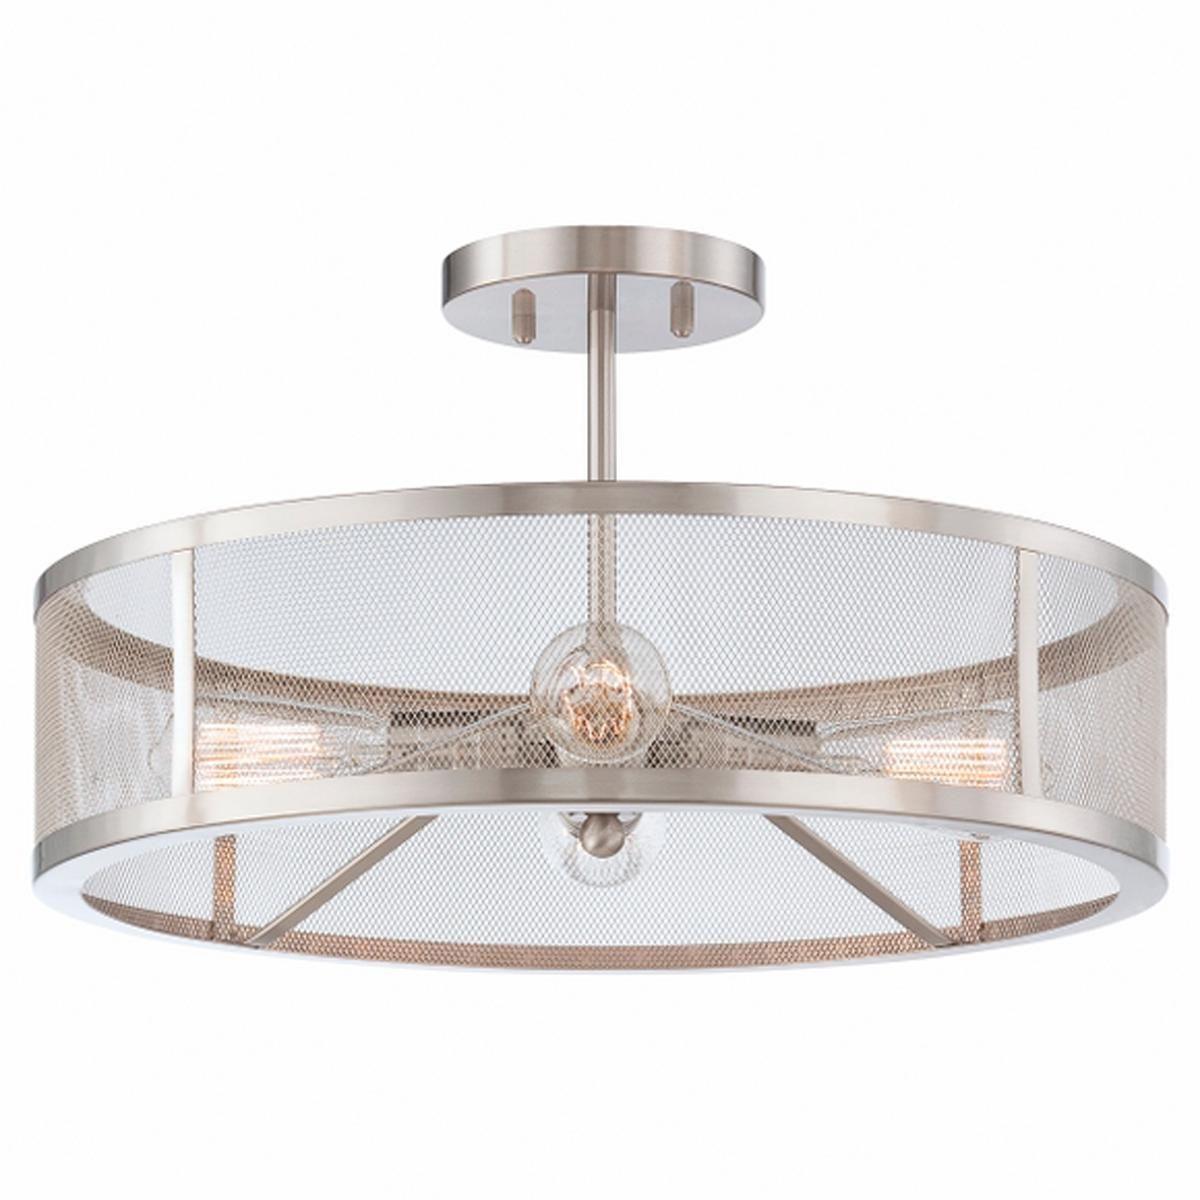 Mesh industrial semi flush mount ceiling light flush mount mudroom mesh industrial semi flush mount ceiling light brushed nickel 290 11h x 19w aloadofball Gallery